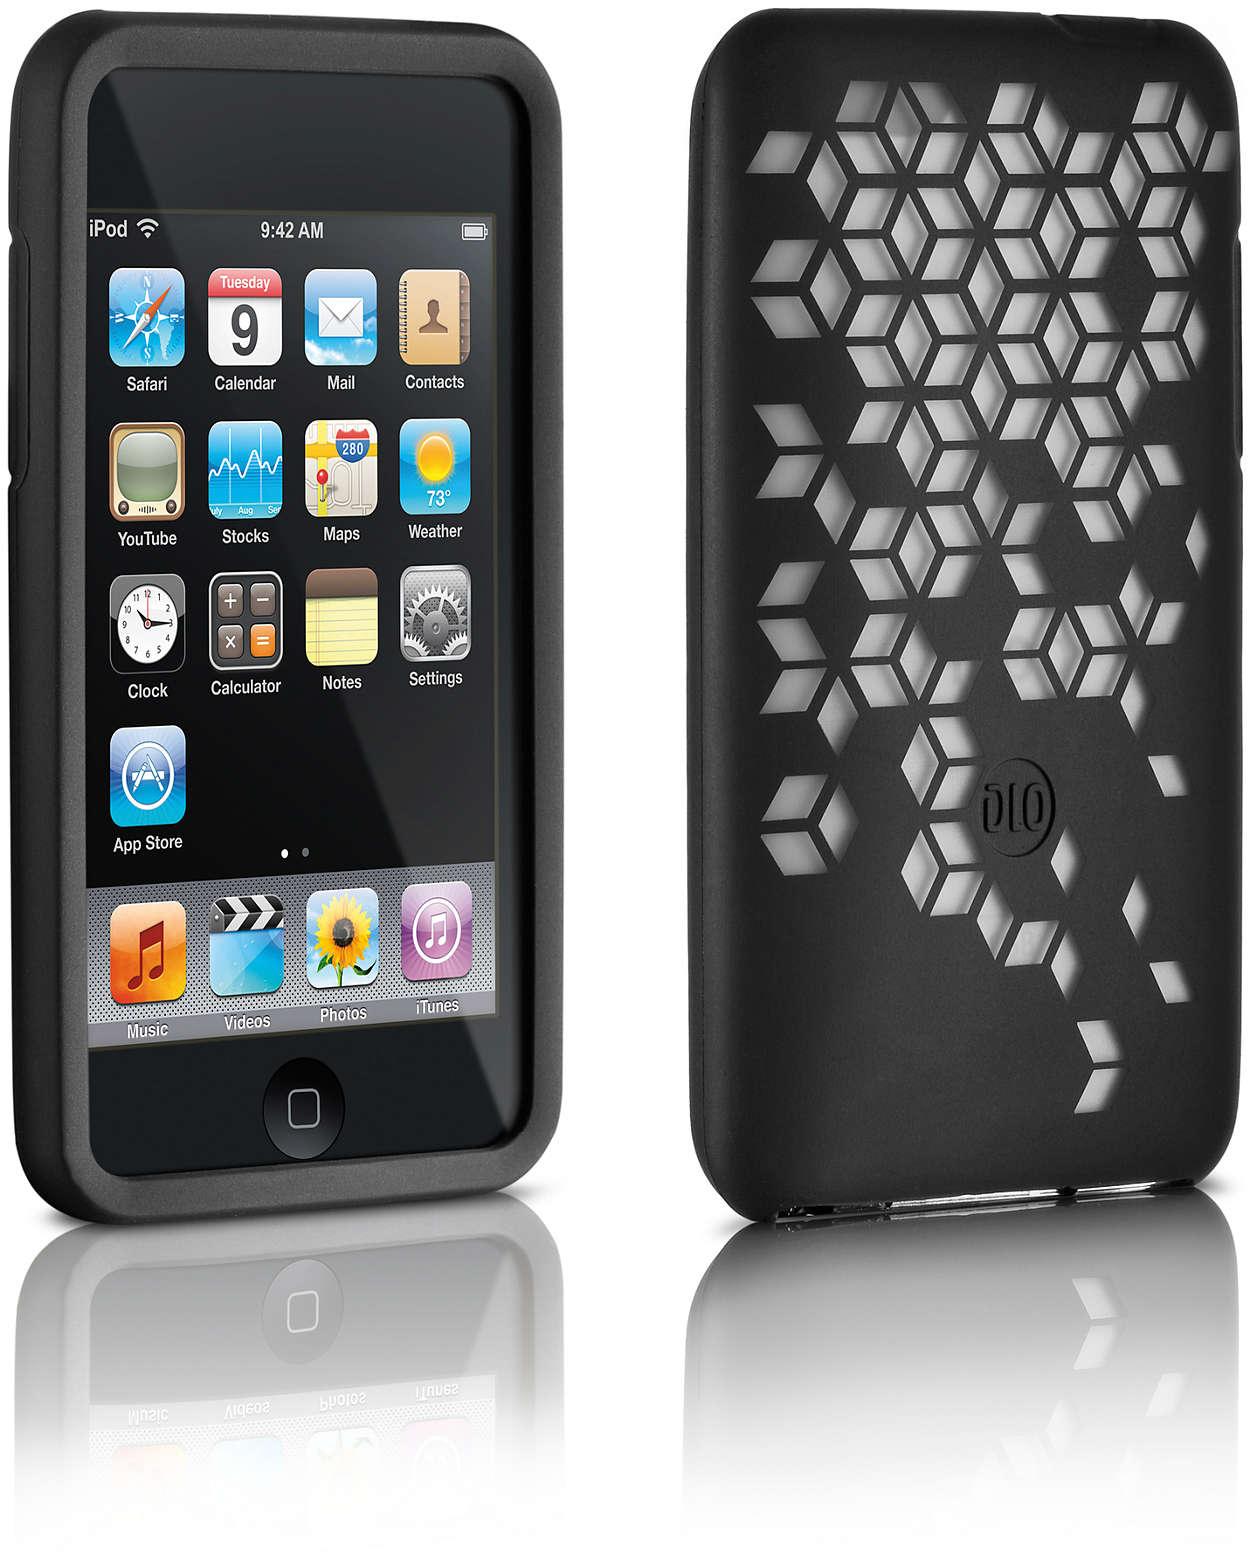 Protege tu iPod con estilo